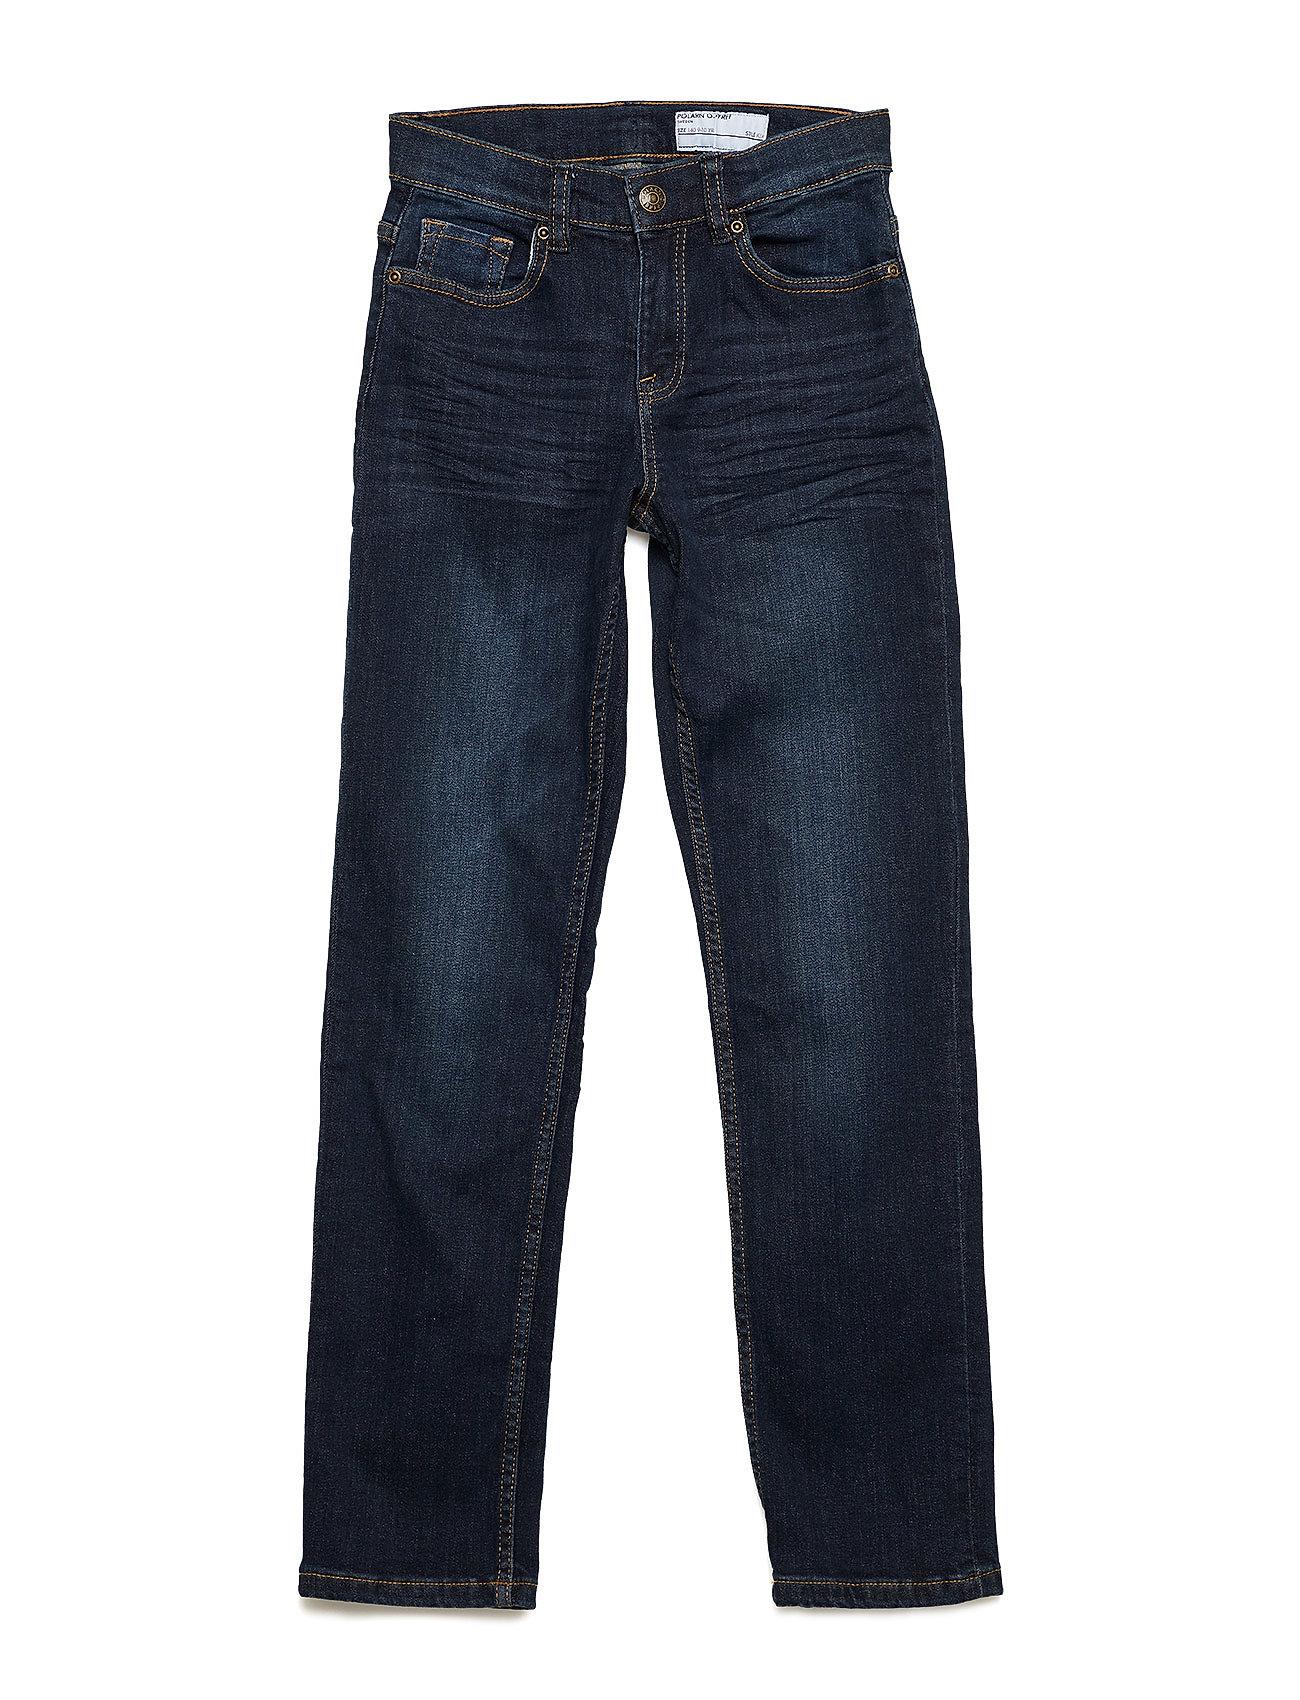 Polarn O. Pyret Jeans Regular School - MID DENIM